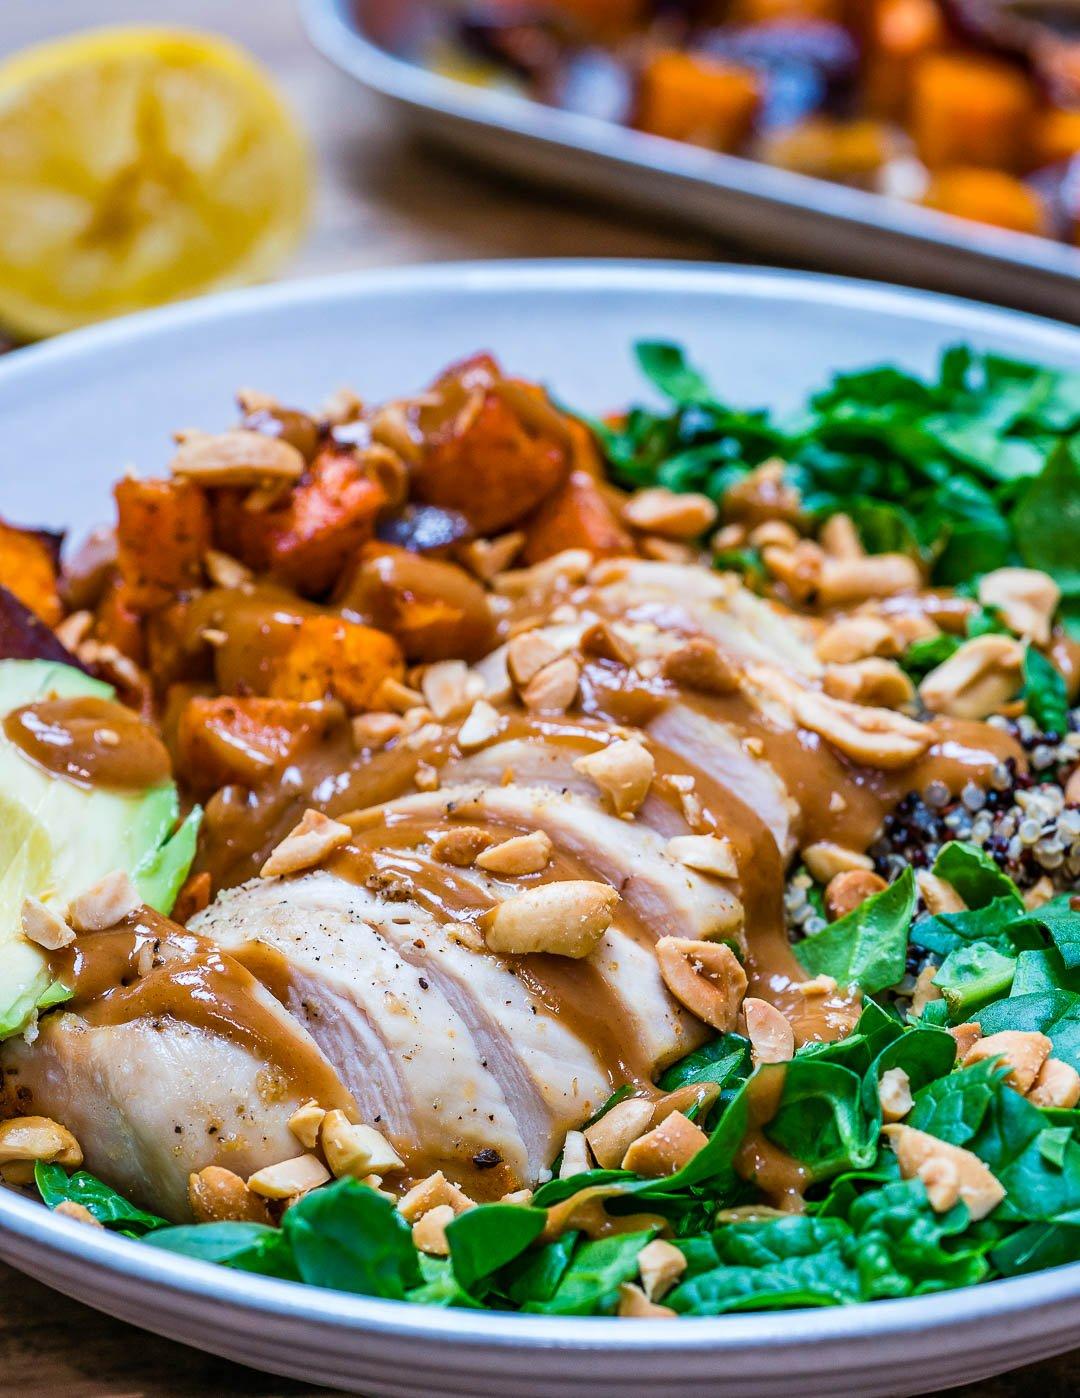 Salata De Pui Cu Legume La Cuptor si Quinoa - Reteta Video 3